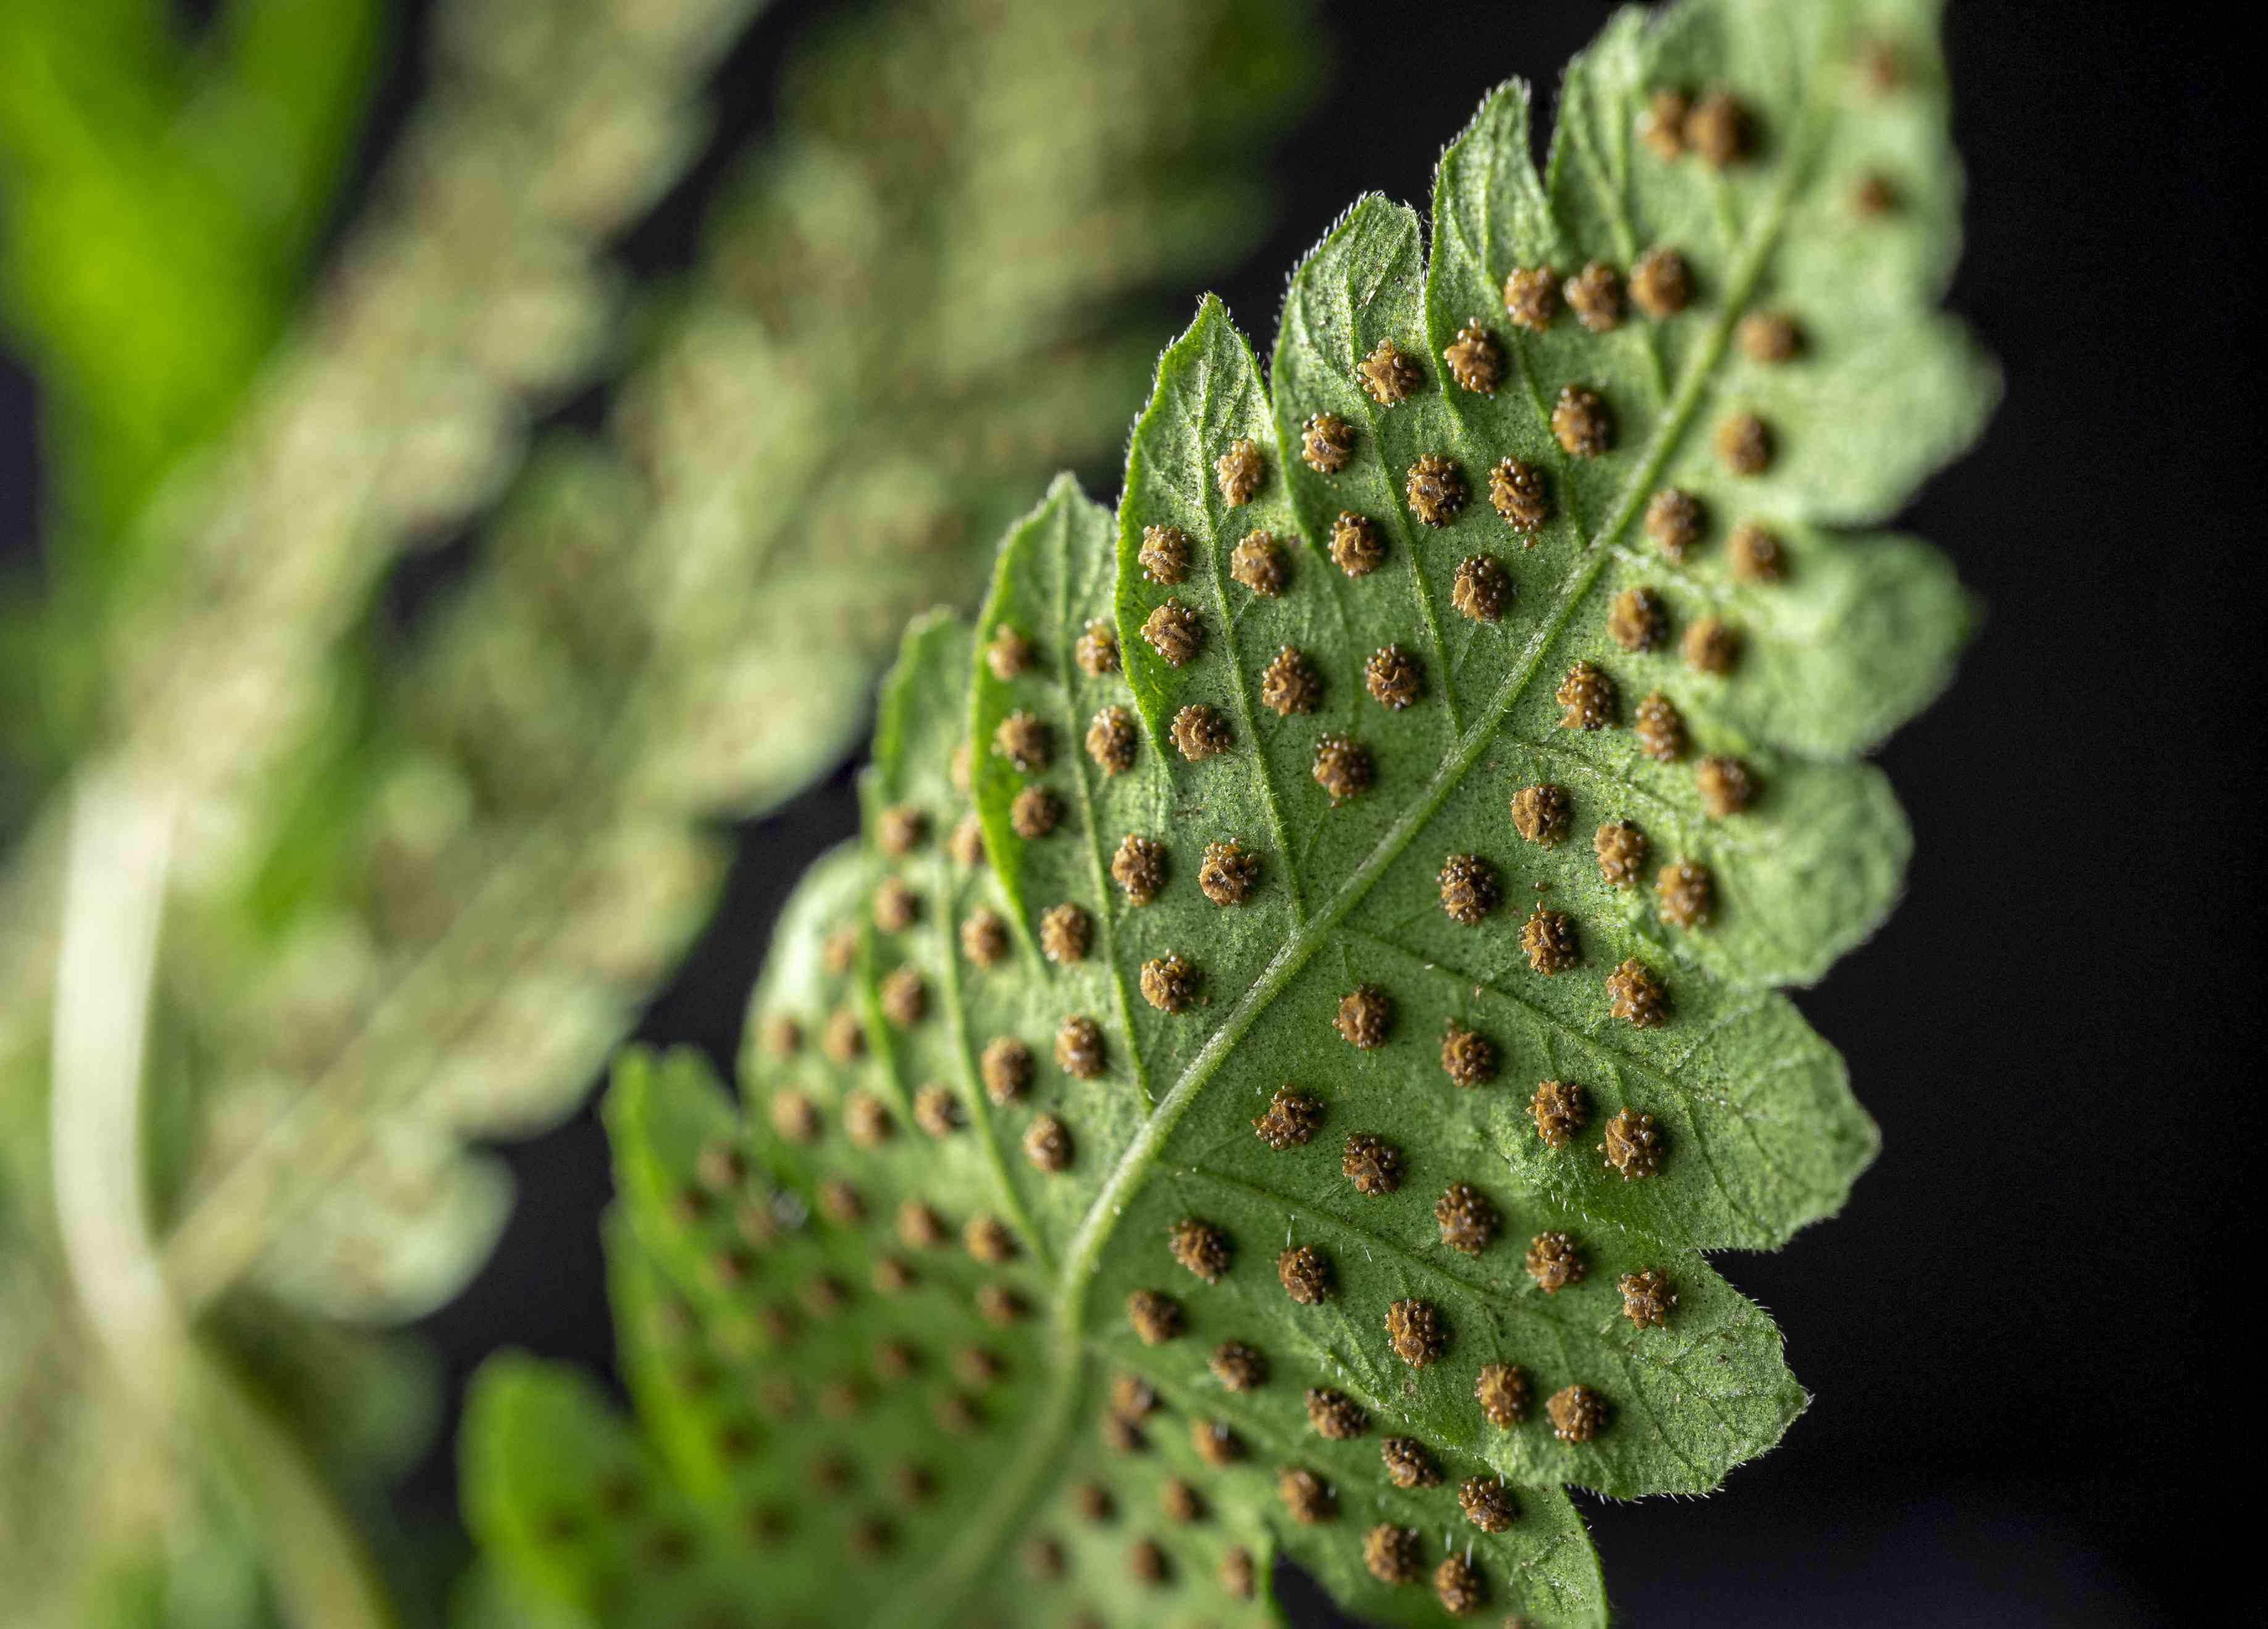 Western sword fern (Polystichum munitum) spores on the backside of a frond.